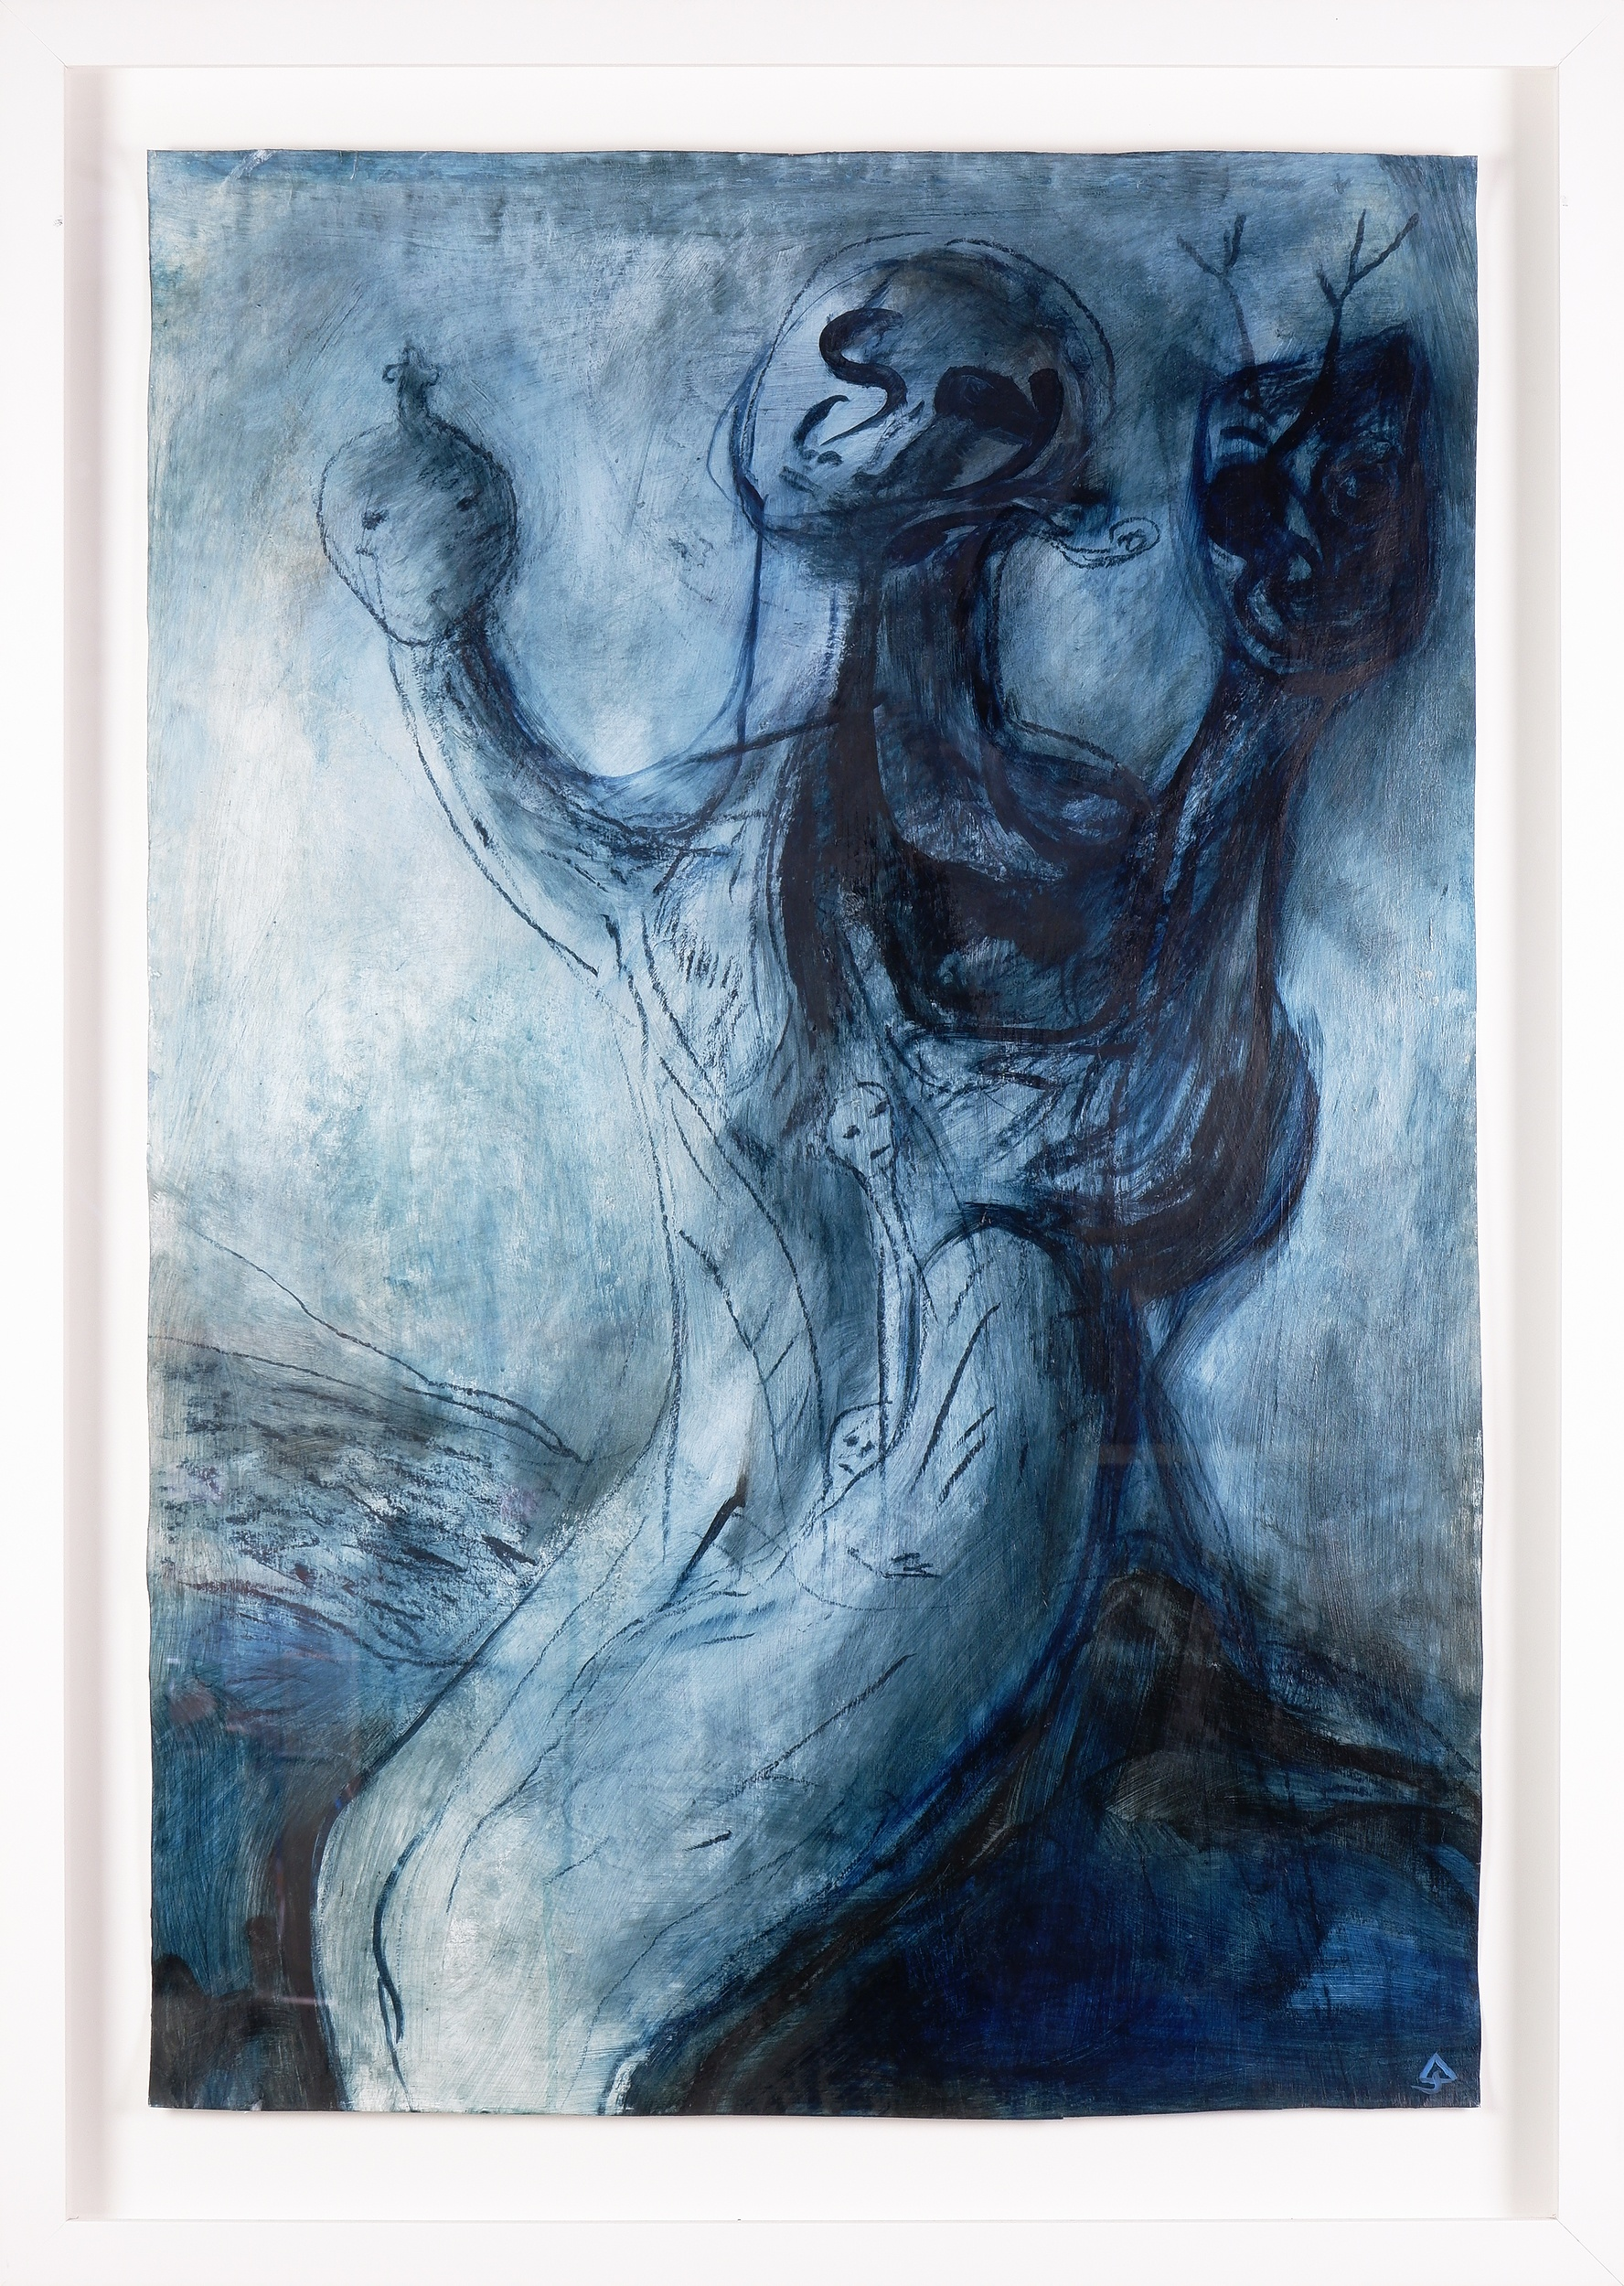 'James Davis (1940-2019), Bohemian Relics I 1997, Acrylic on Paper, 95 x 65 cm'